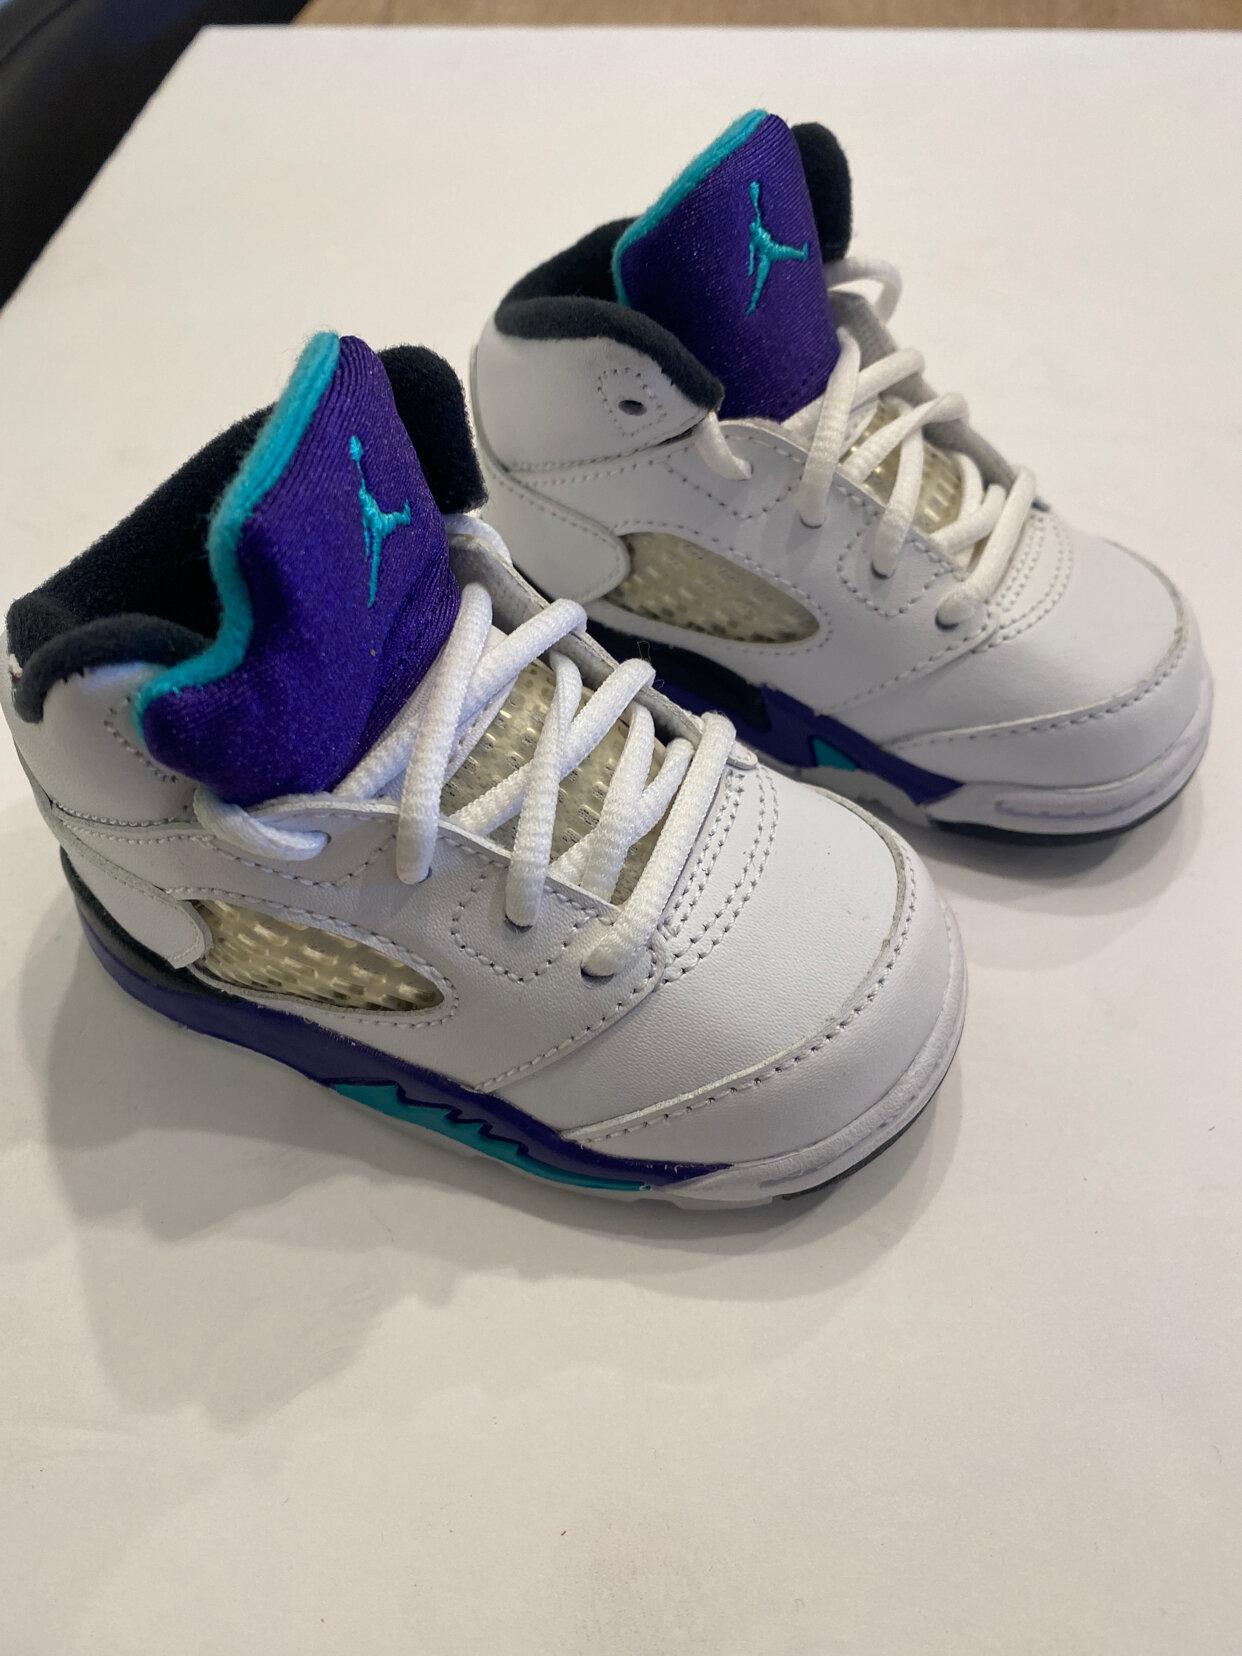 Jordan's Jordan infant shoes Size 4 Infant